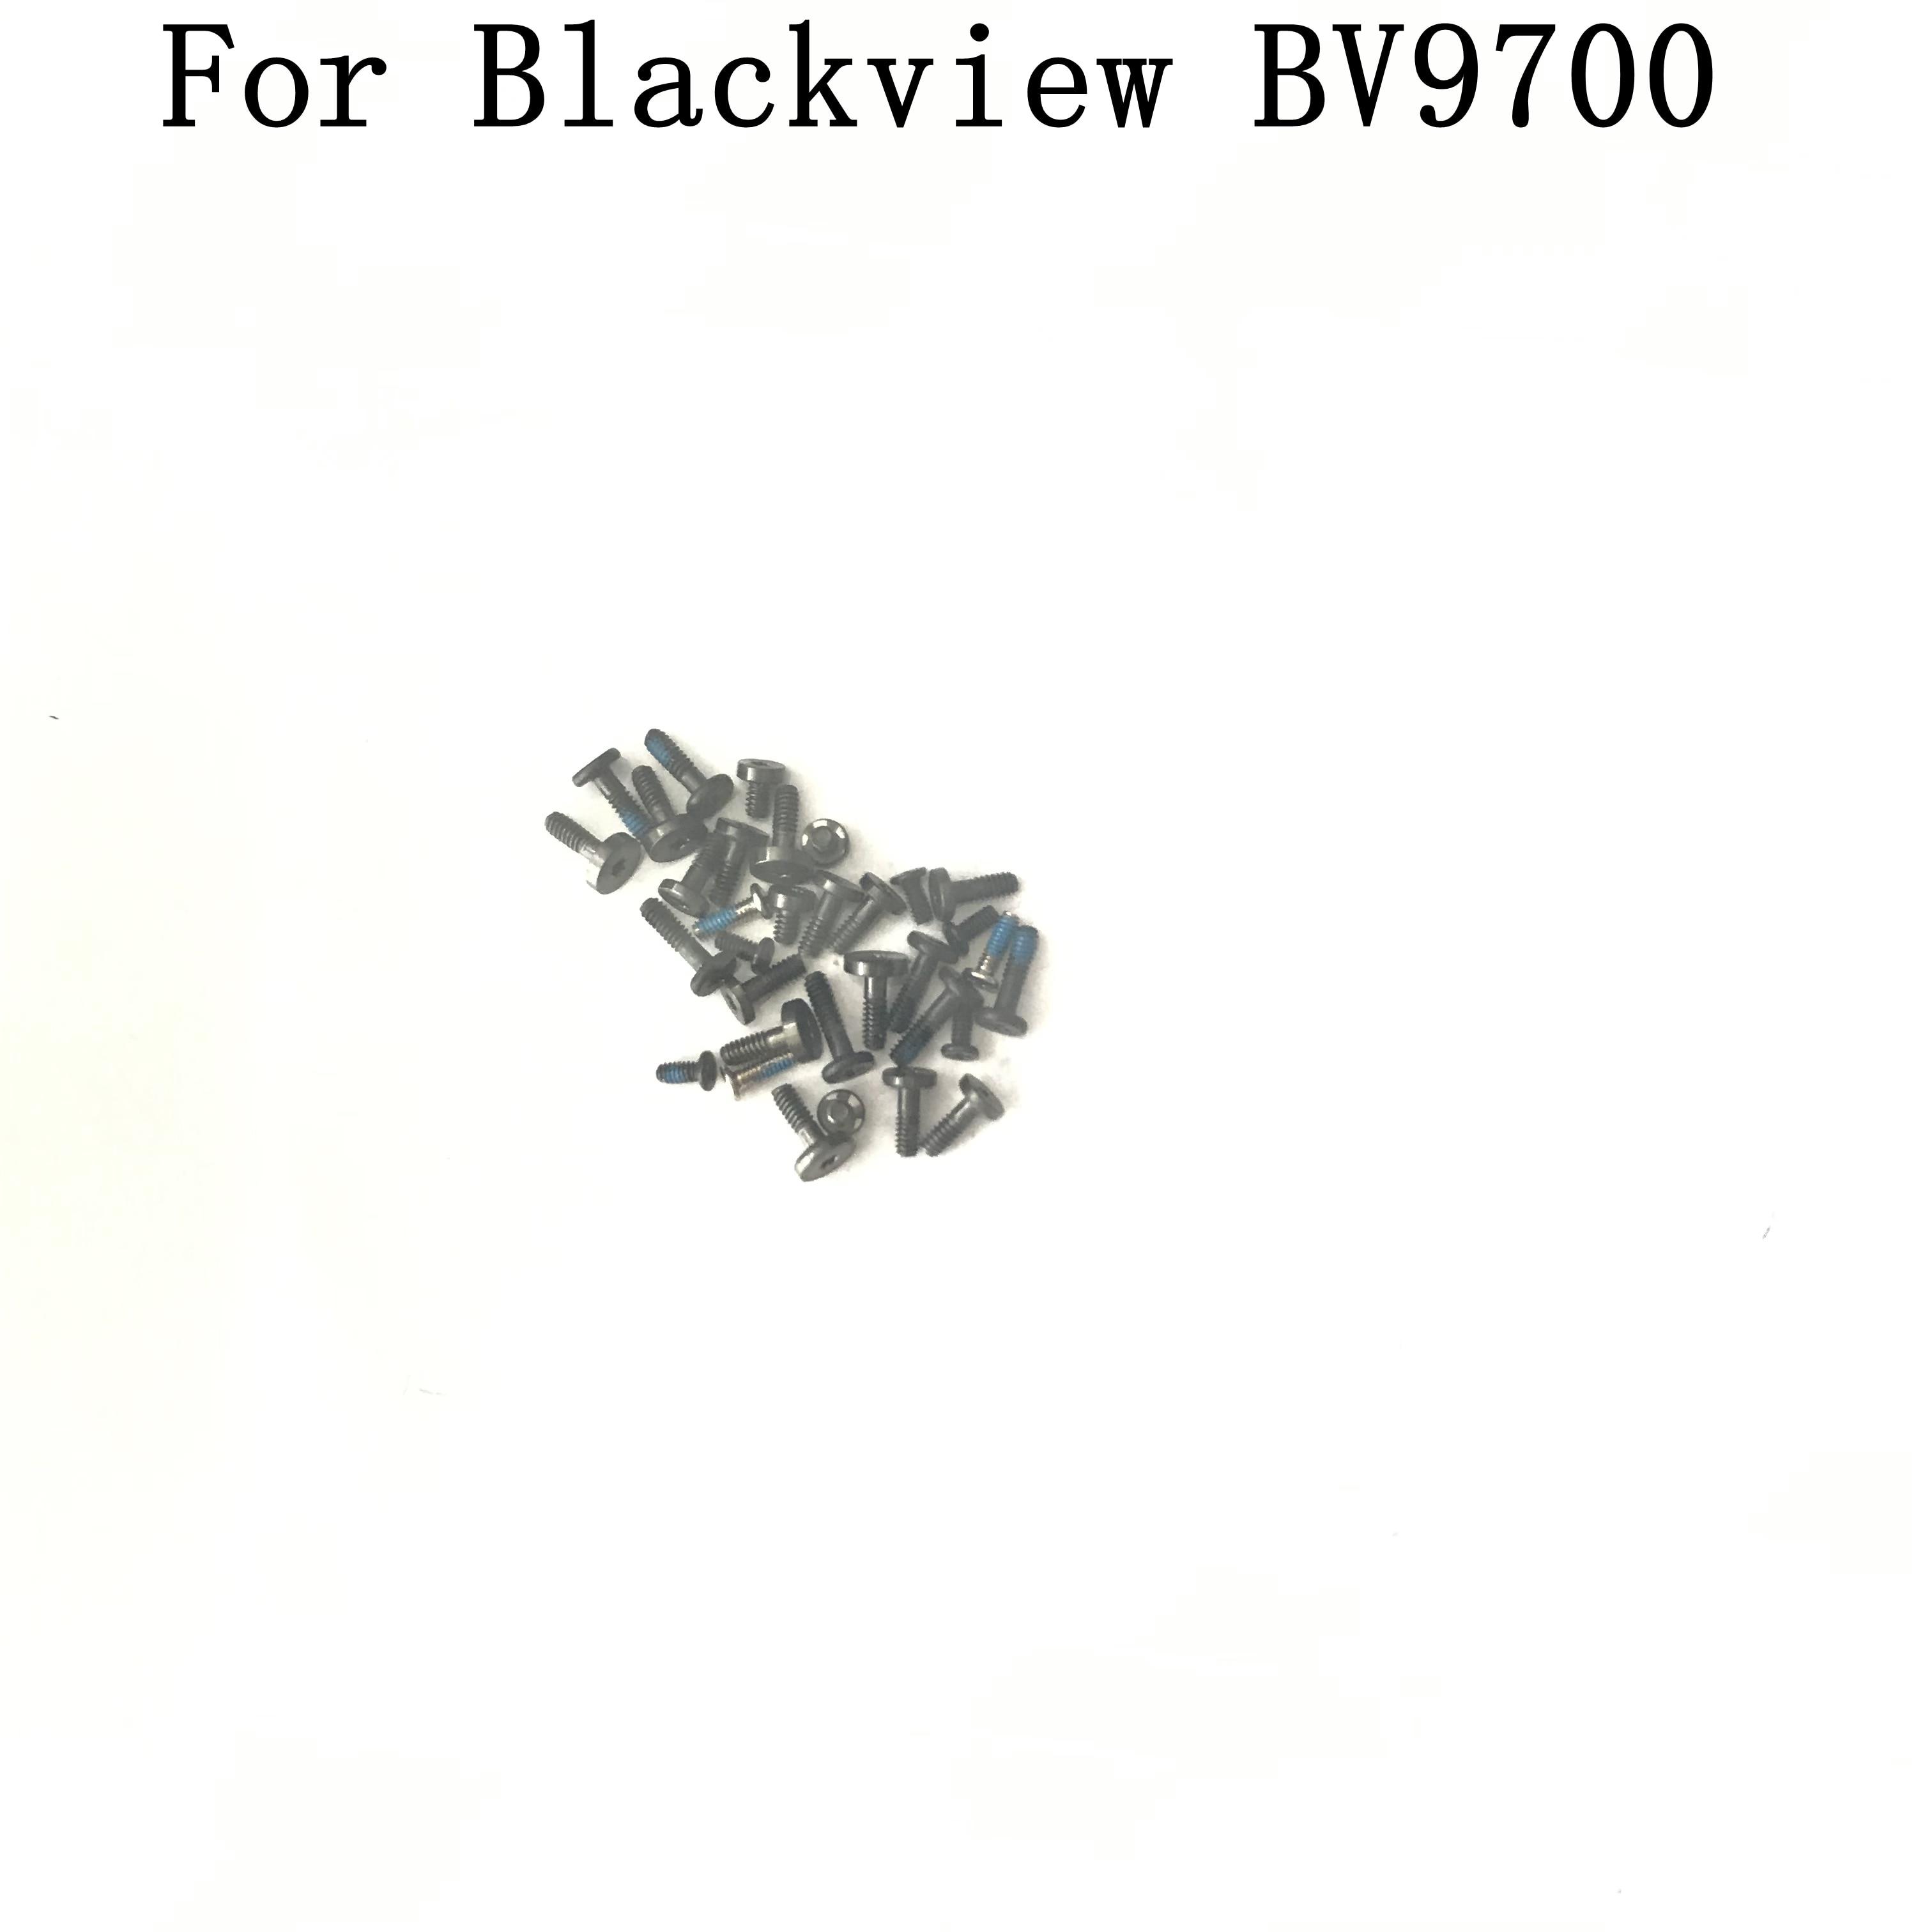 Blackview BV9700 New Phone Case Screws For Blackview BV9700 Pro Repair Fixing Part Replacement